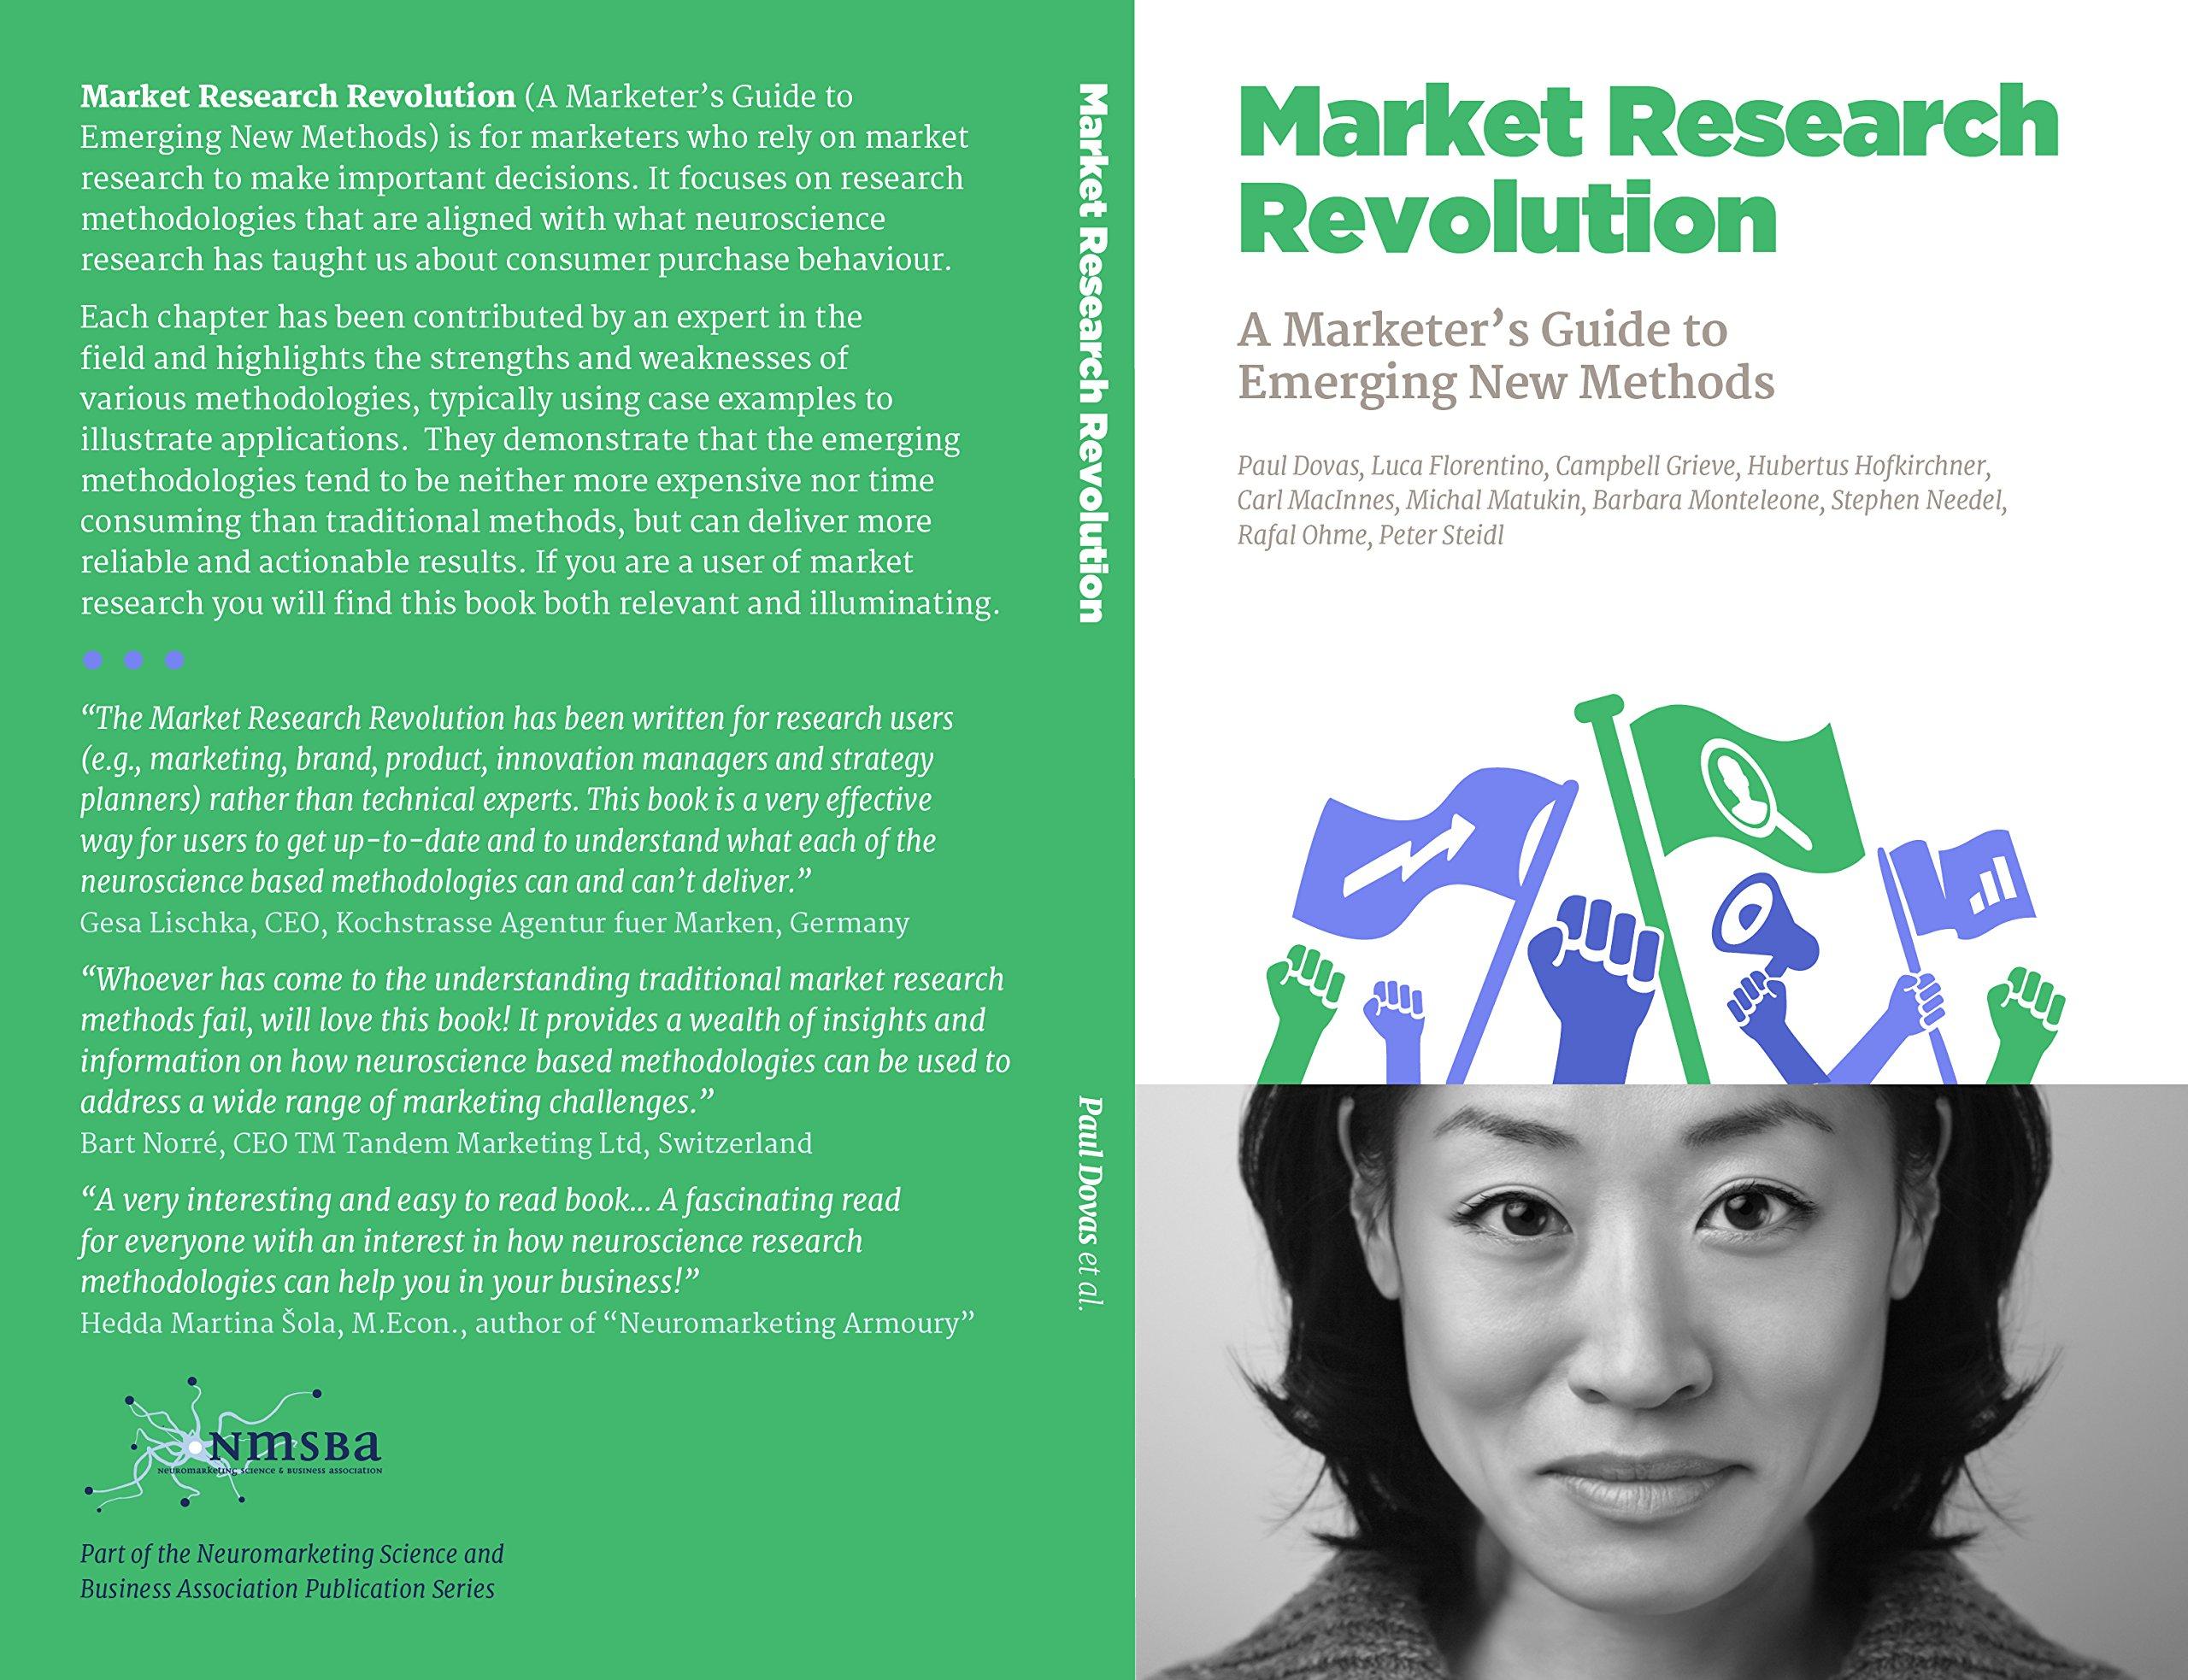 The Market Research Revolution (NMSBA Book 5)